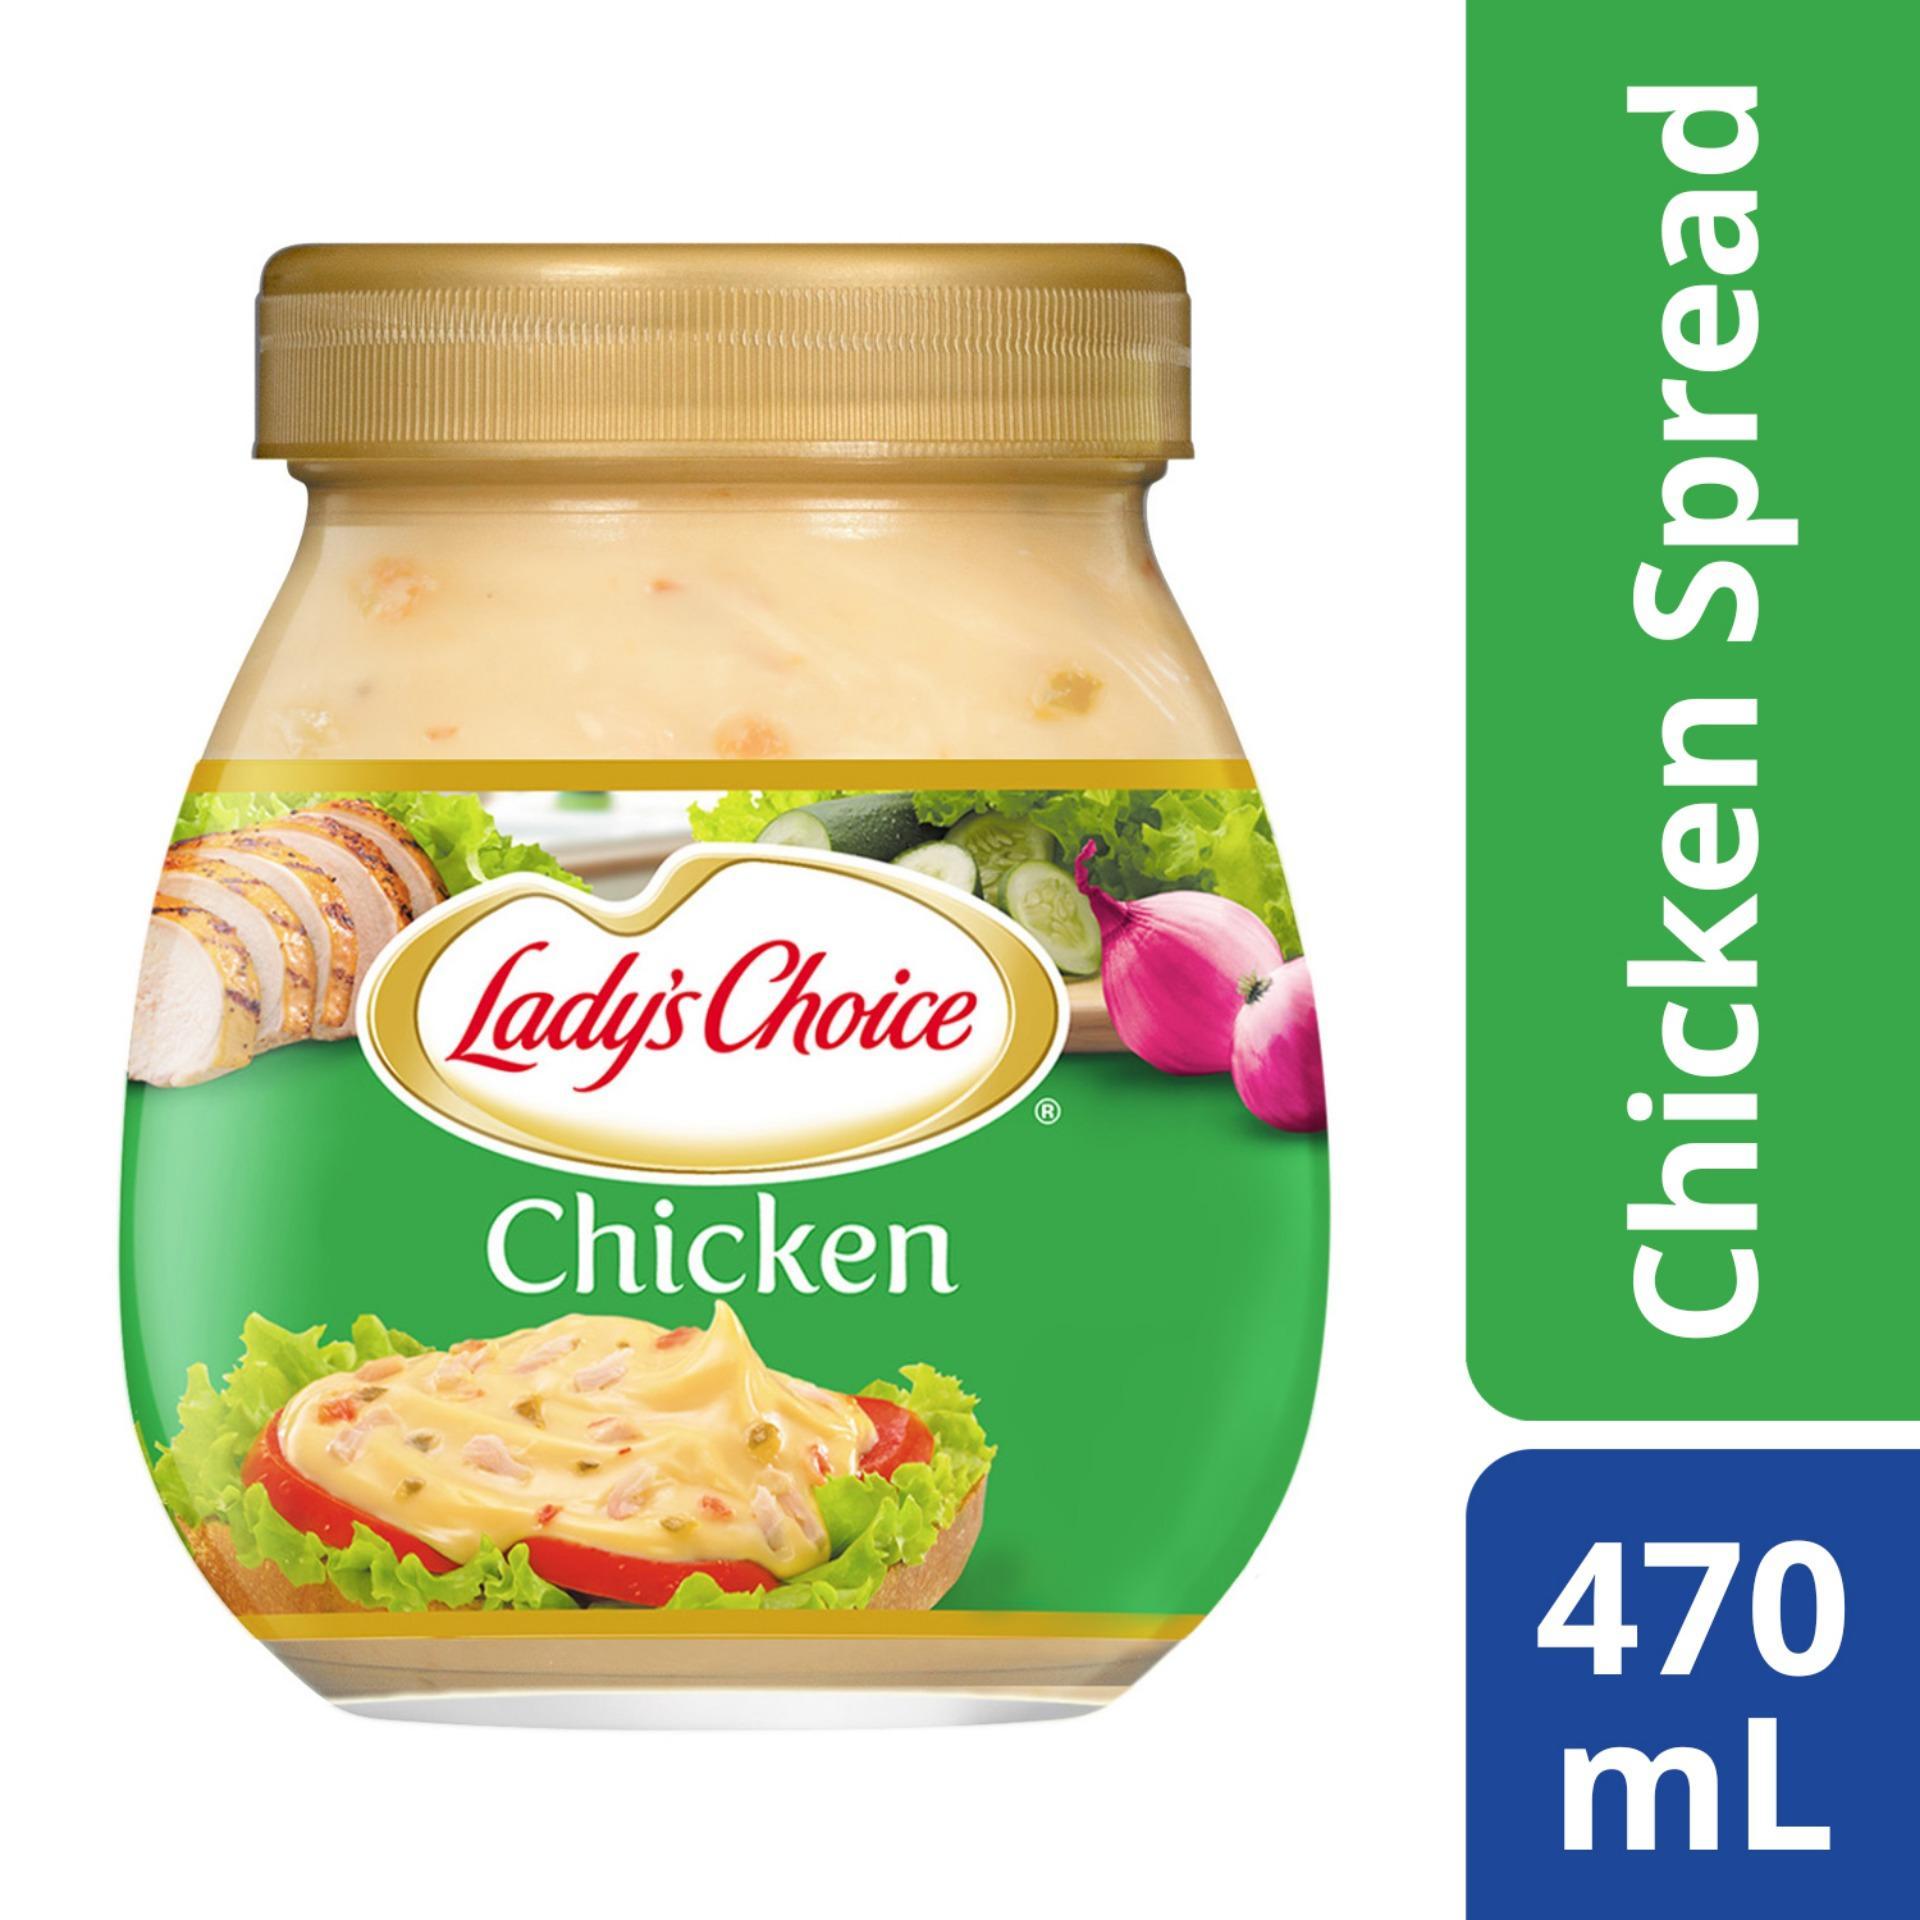 Ladys Choice Chicken Sandwich Spread 470ml By Unilever Foods.